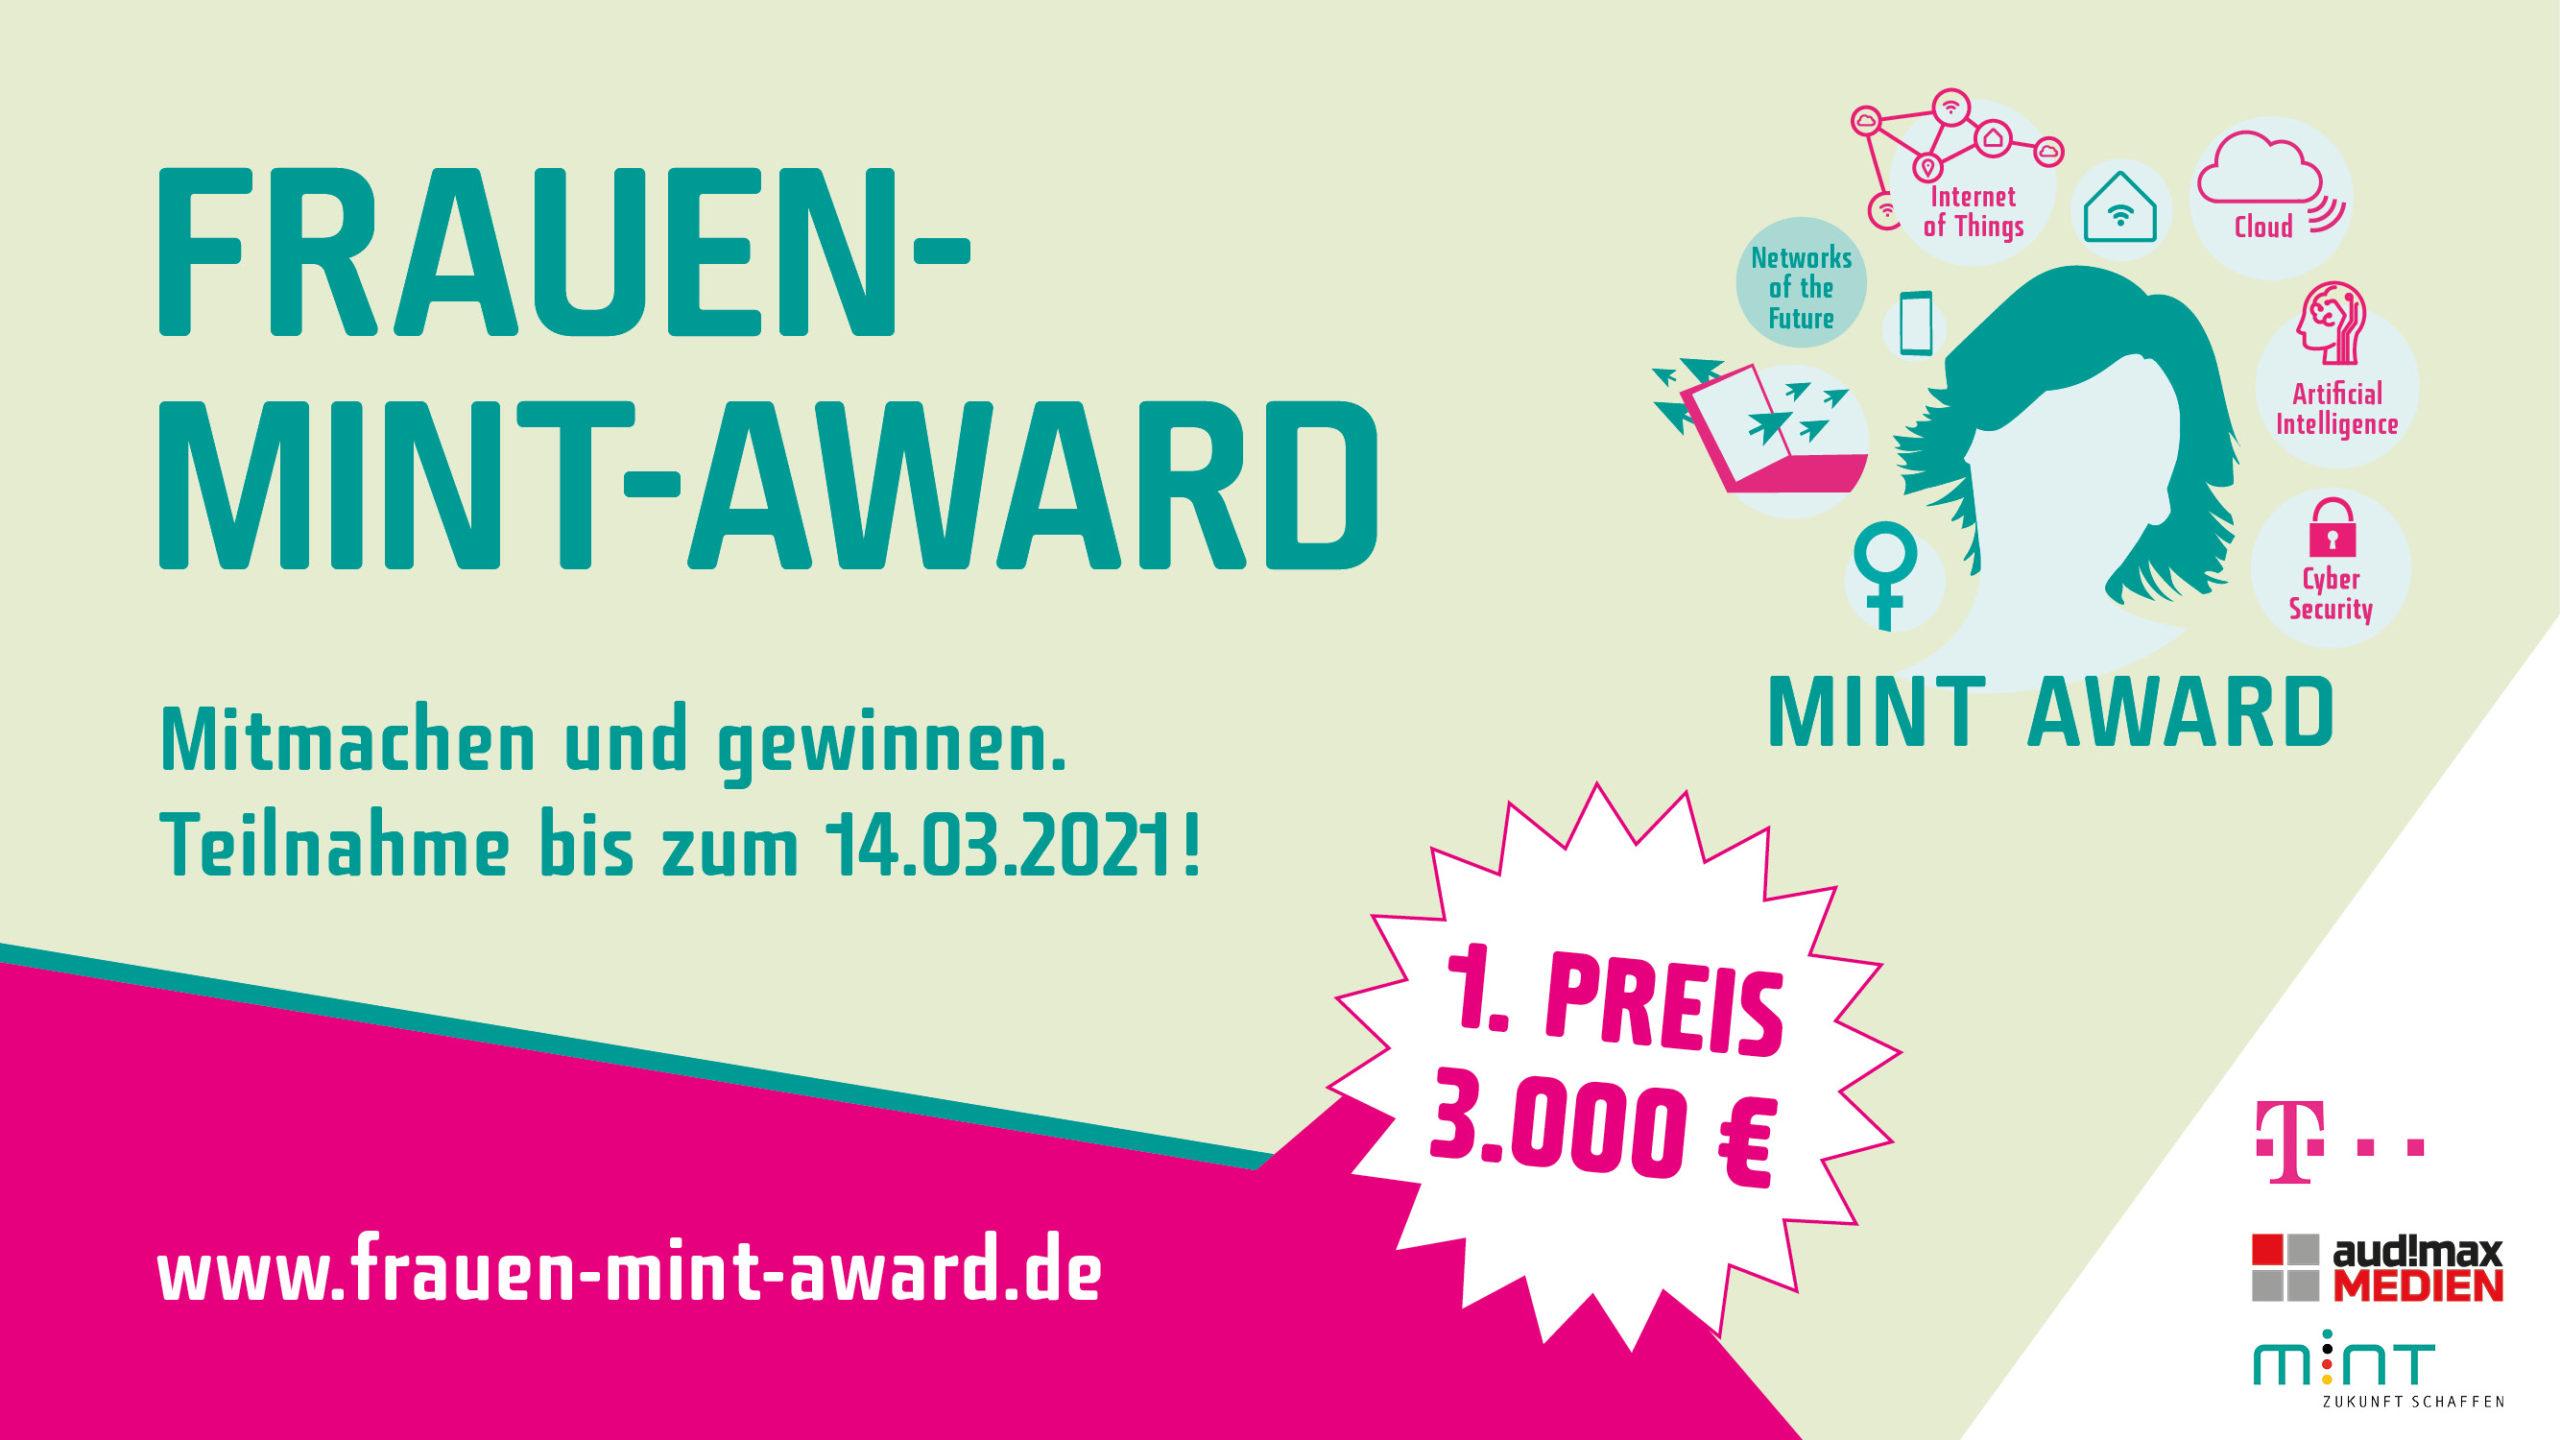 Frauen-MINT-Award 2021